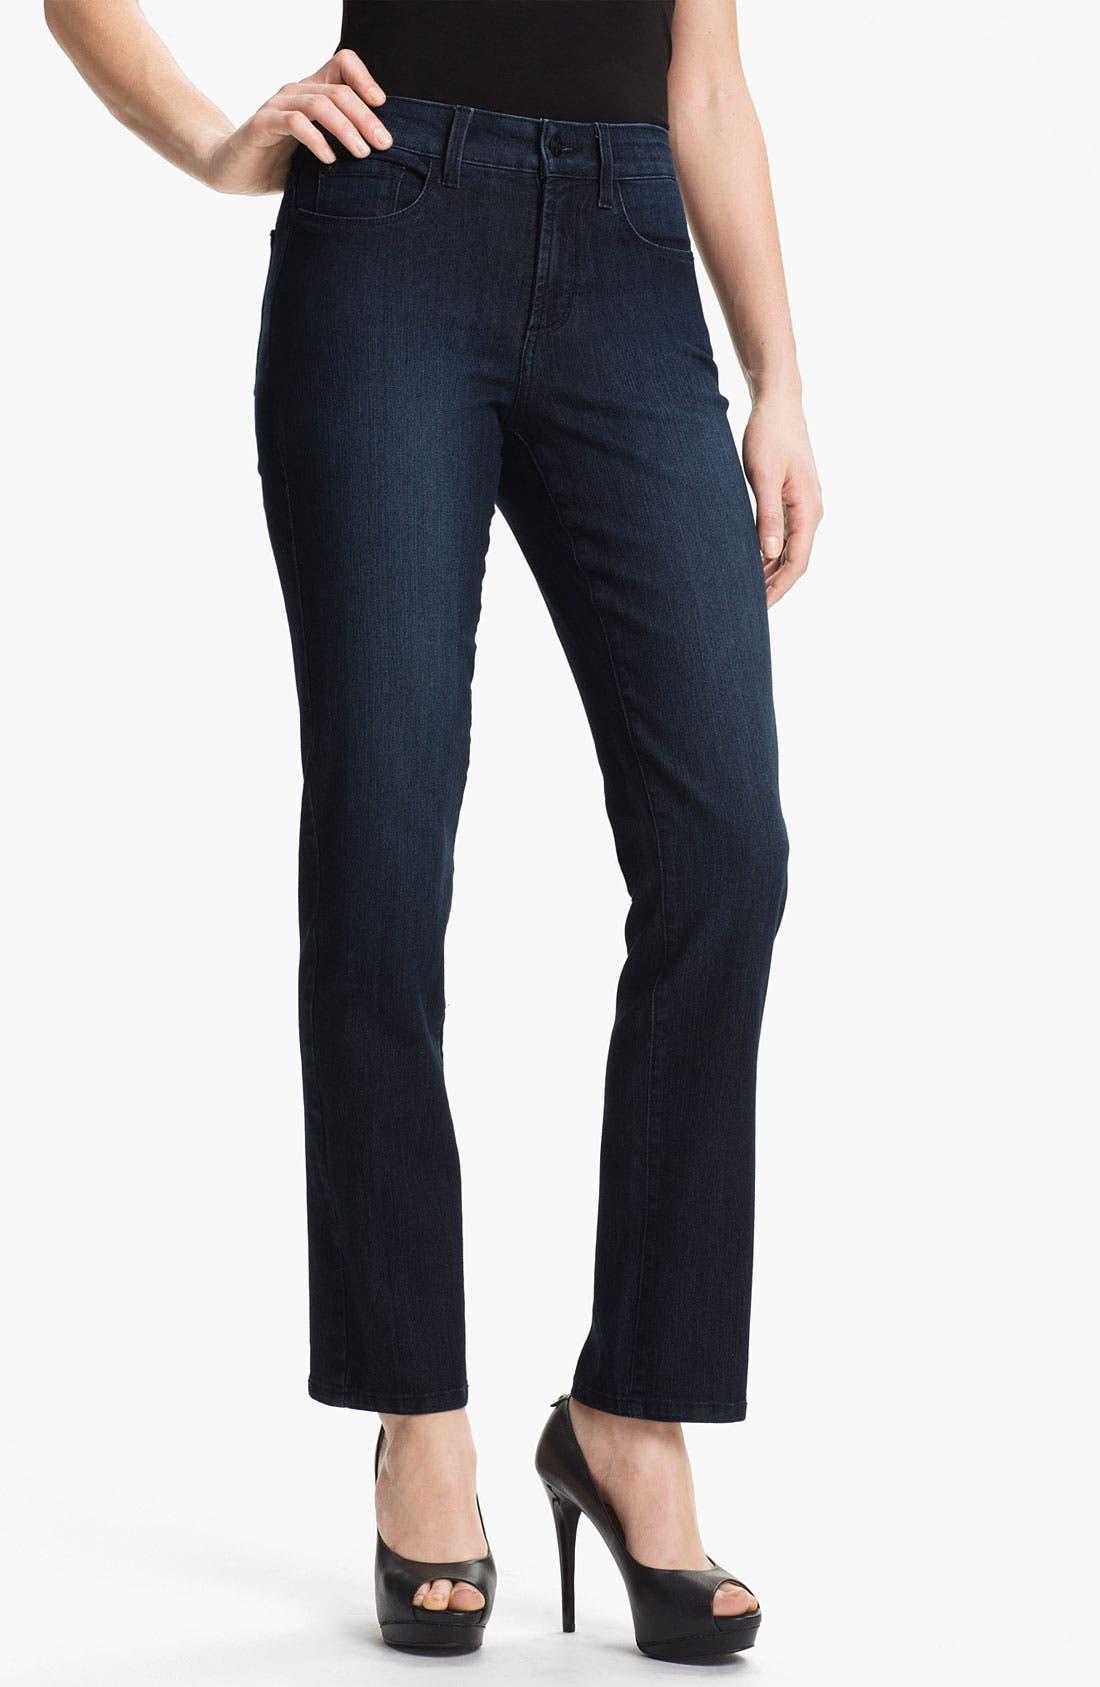 Main Image - NYDJ Studded 'Sheri' Skinny Jeans (Petite)